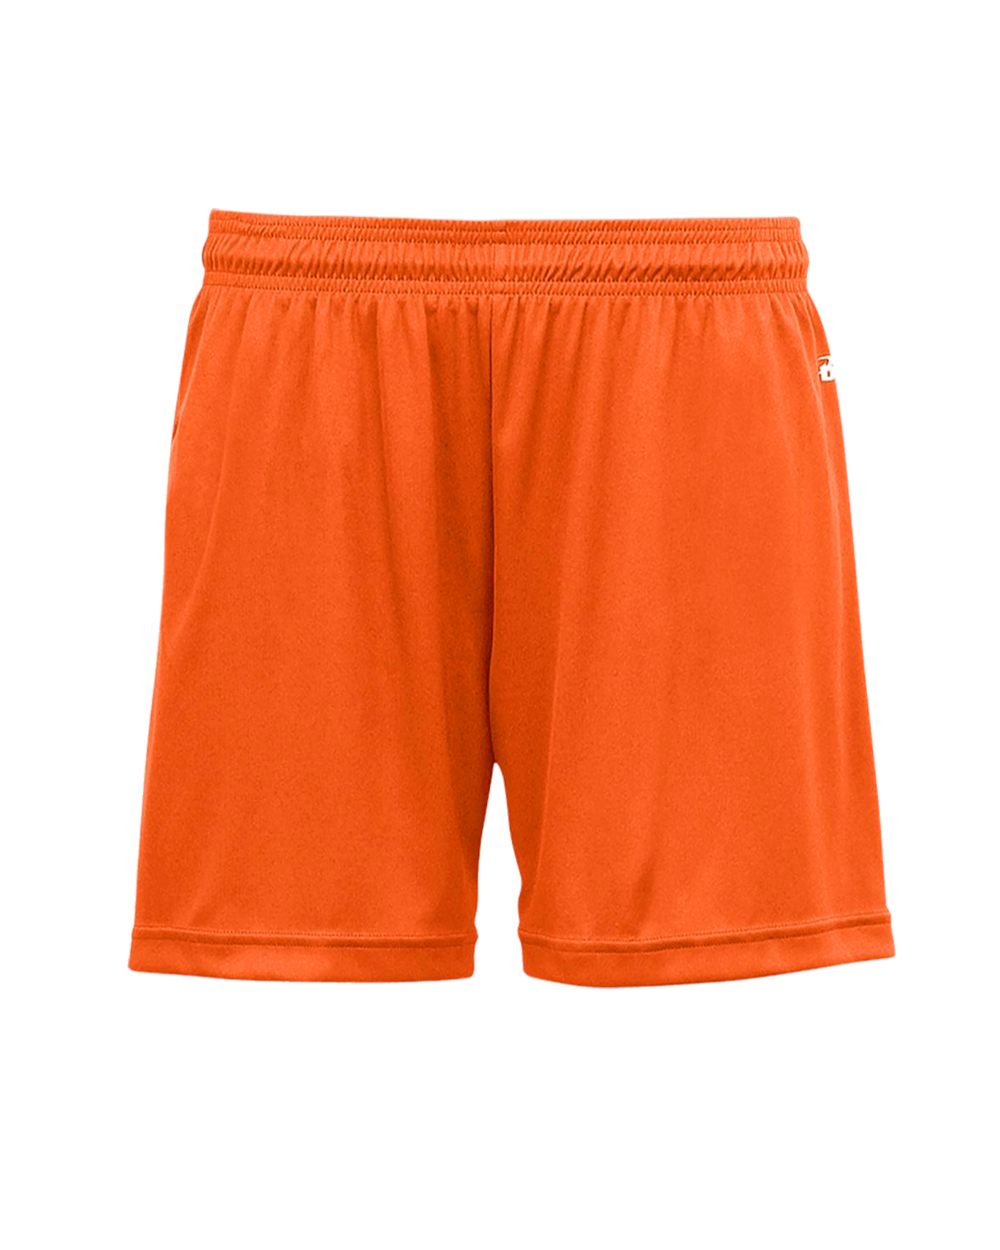 B-Core Women's Short - Burnt Orange